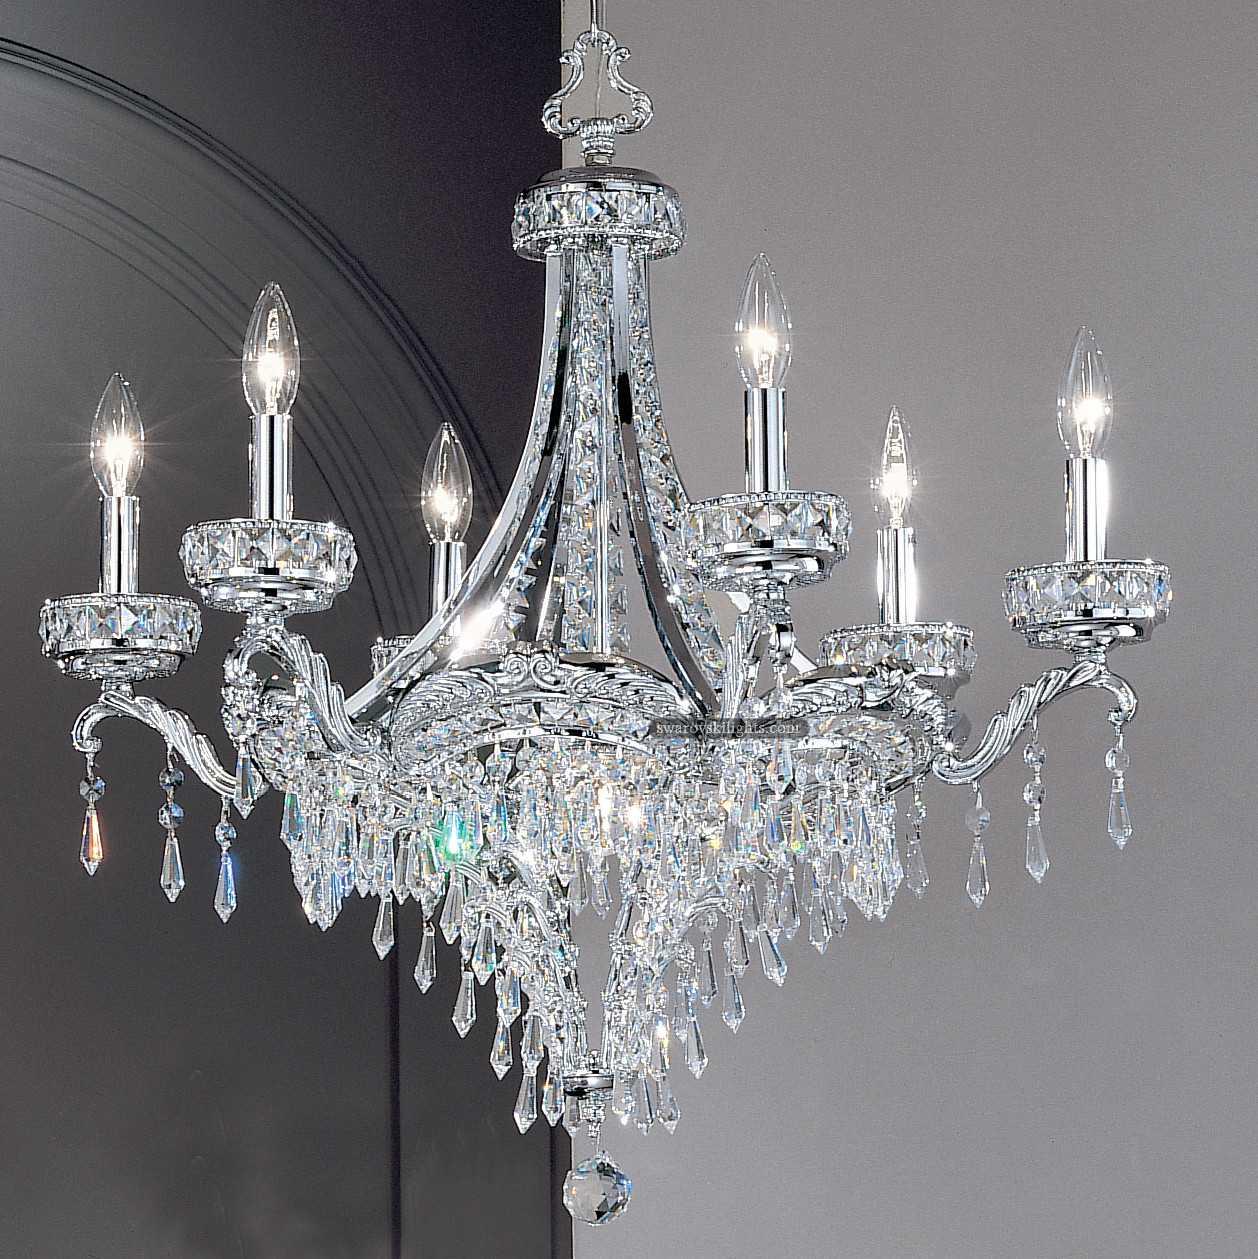 Wrought Iron Crystal Chandeliers Hongkong Sunwe Lighting Co Ltd We Specialize In Making Swarovski Chandelier